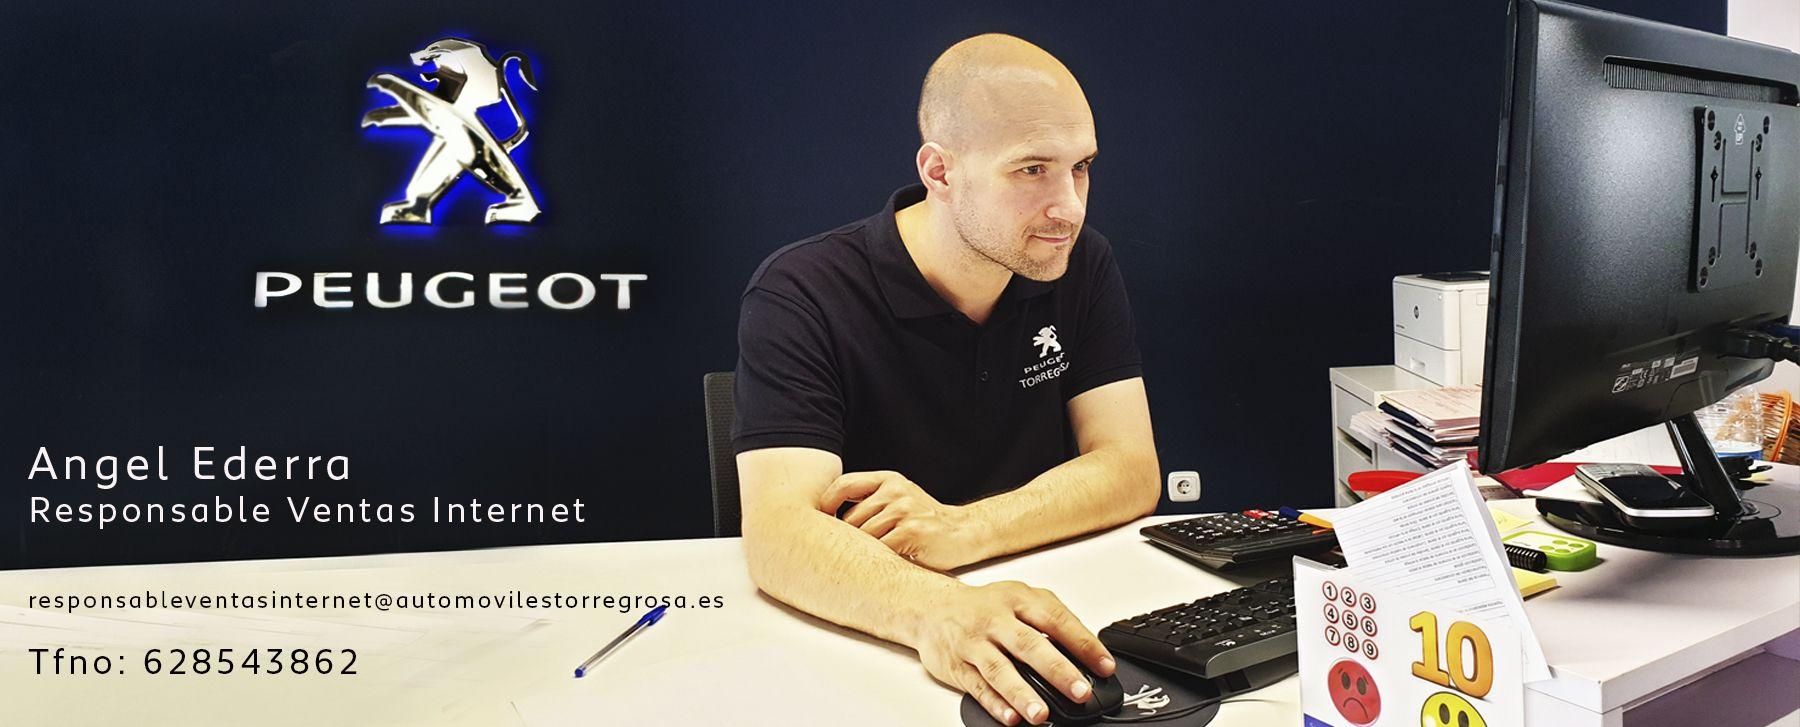 Angel Ederra,  Responsable de Ventas por Internet en Peugeot , Automóviles Torregrosa